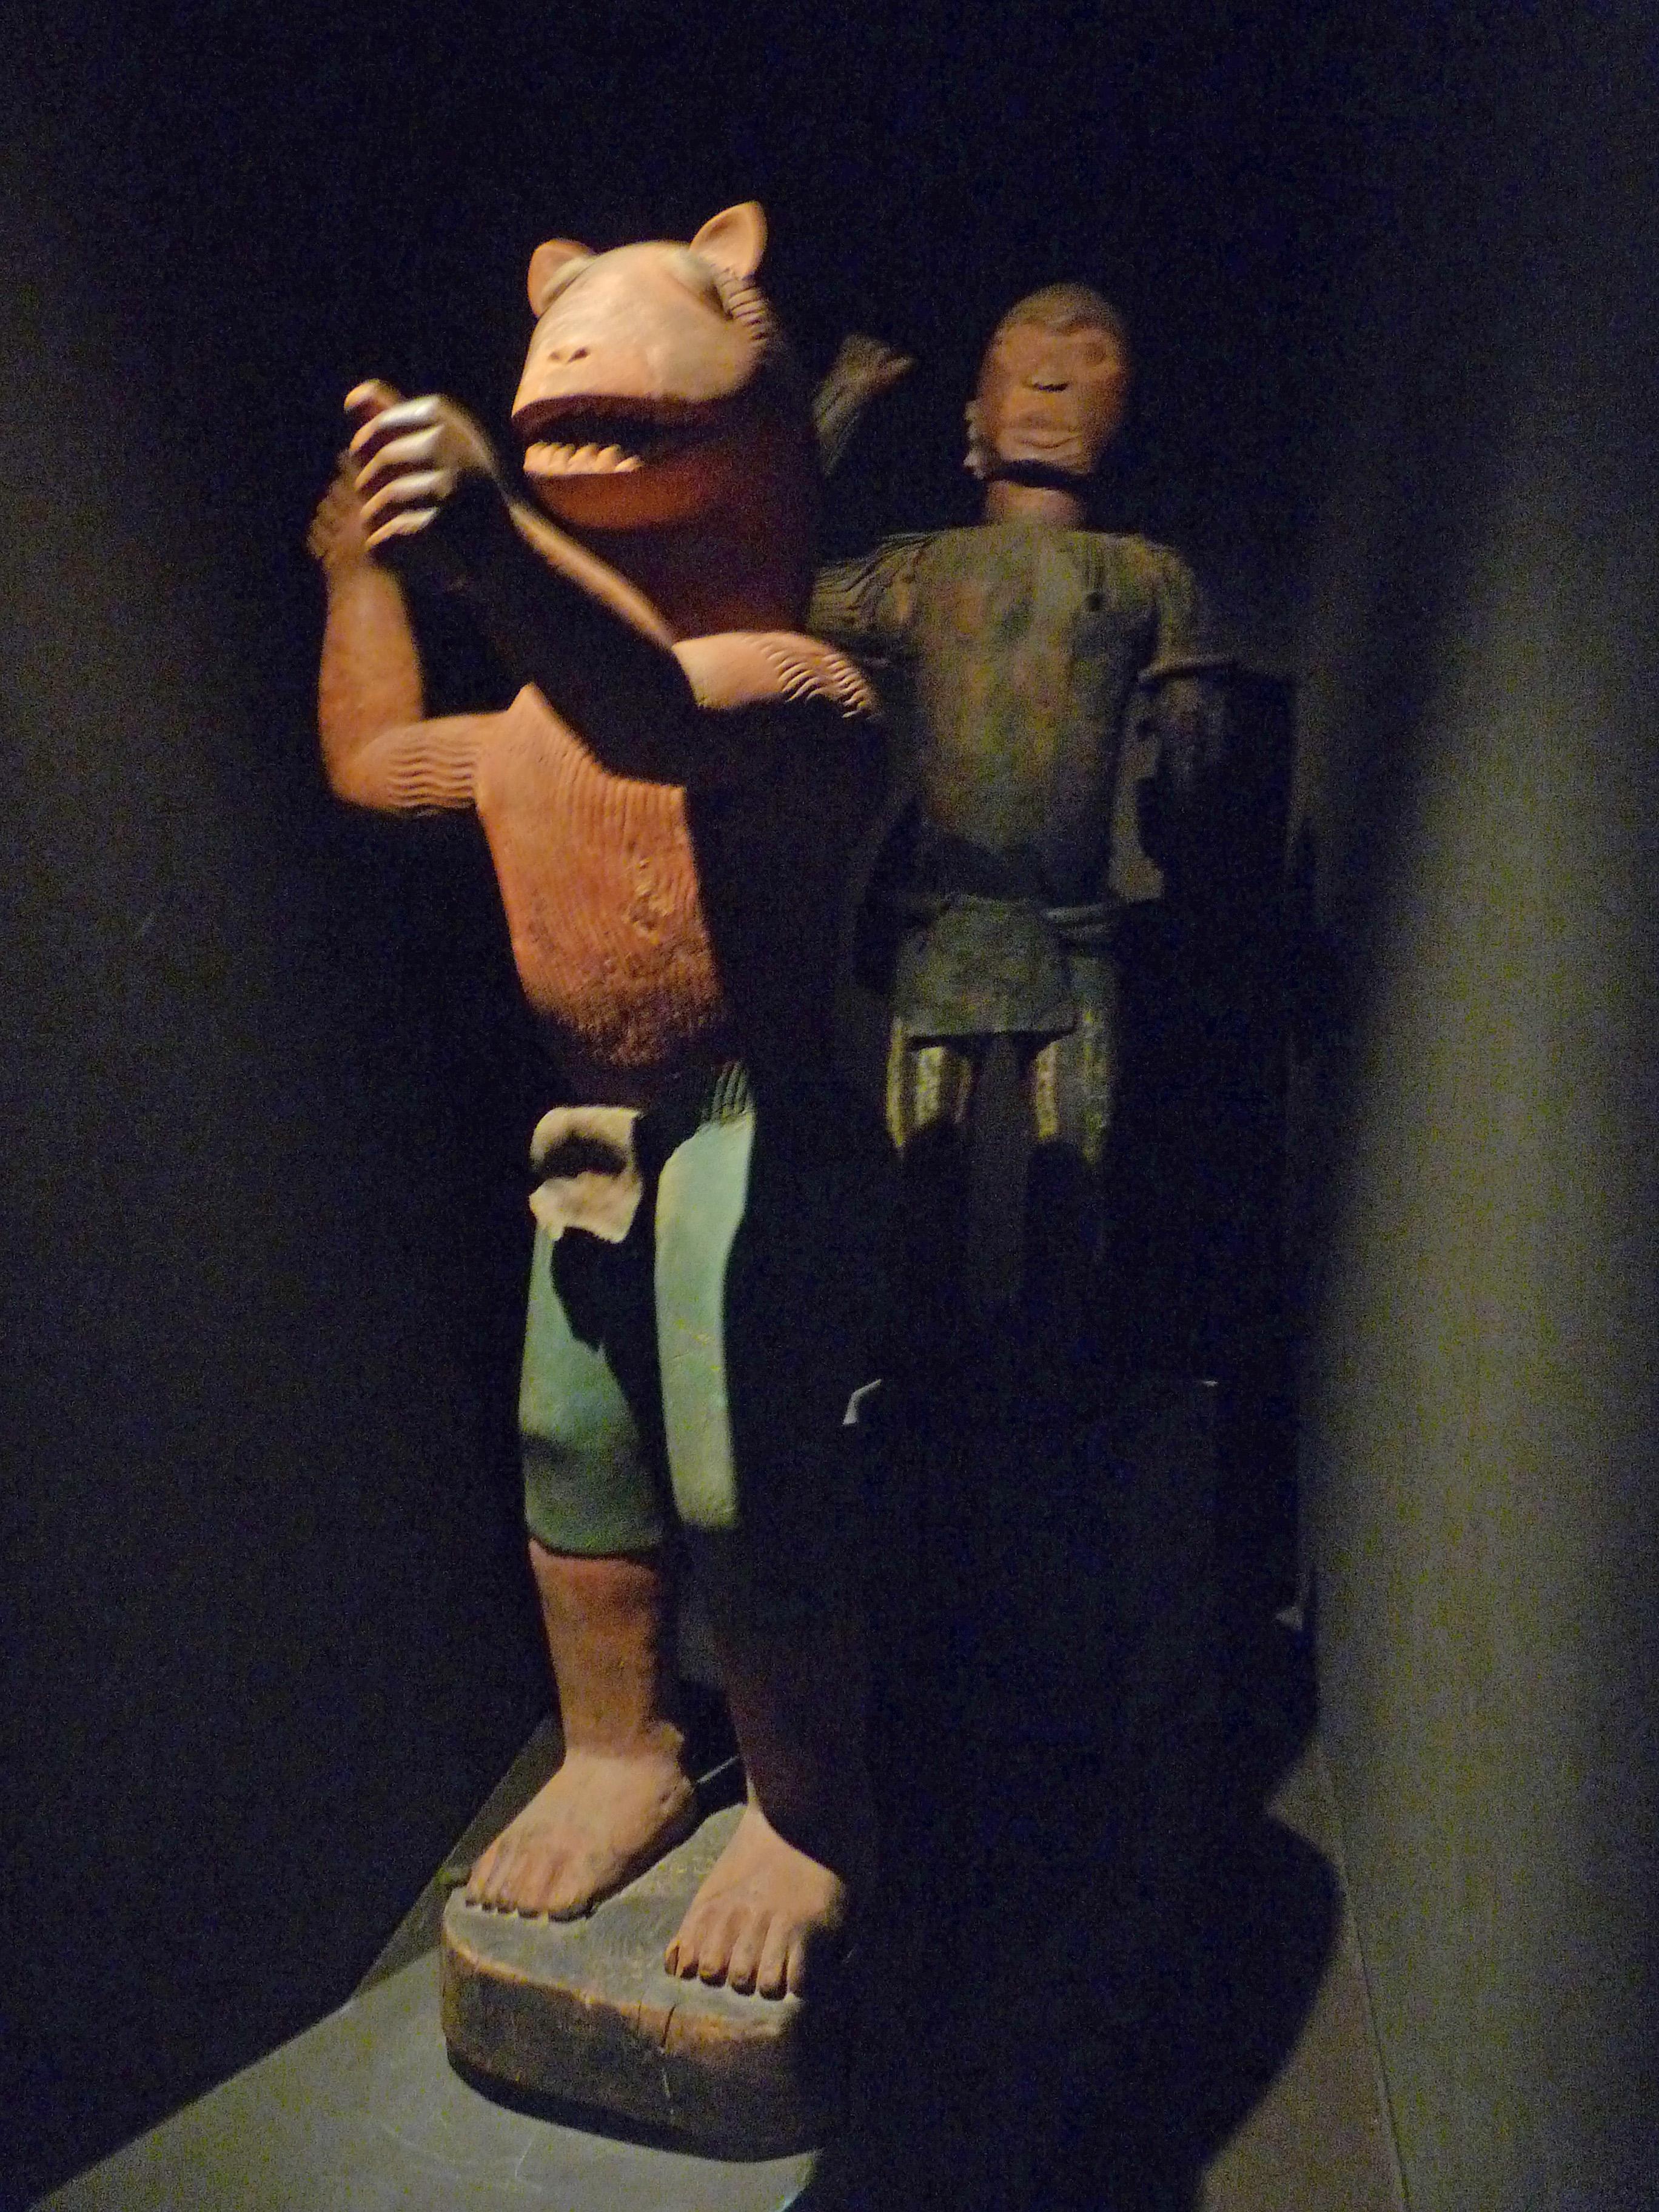 http://upload.wikimedia.org/wikipedia/commons/3/3d/Statue_du_roi_Gl%C3%A9l%C3%A9-Fon_(2).jpg